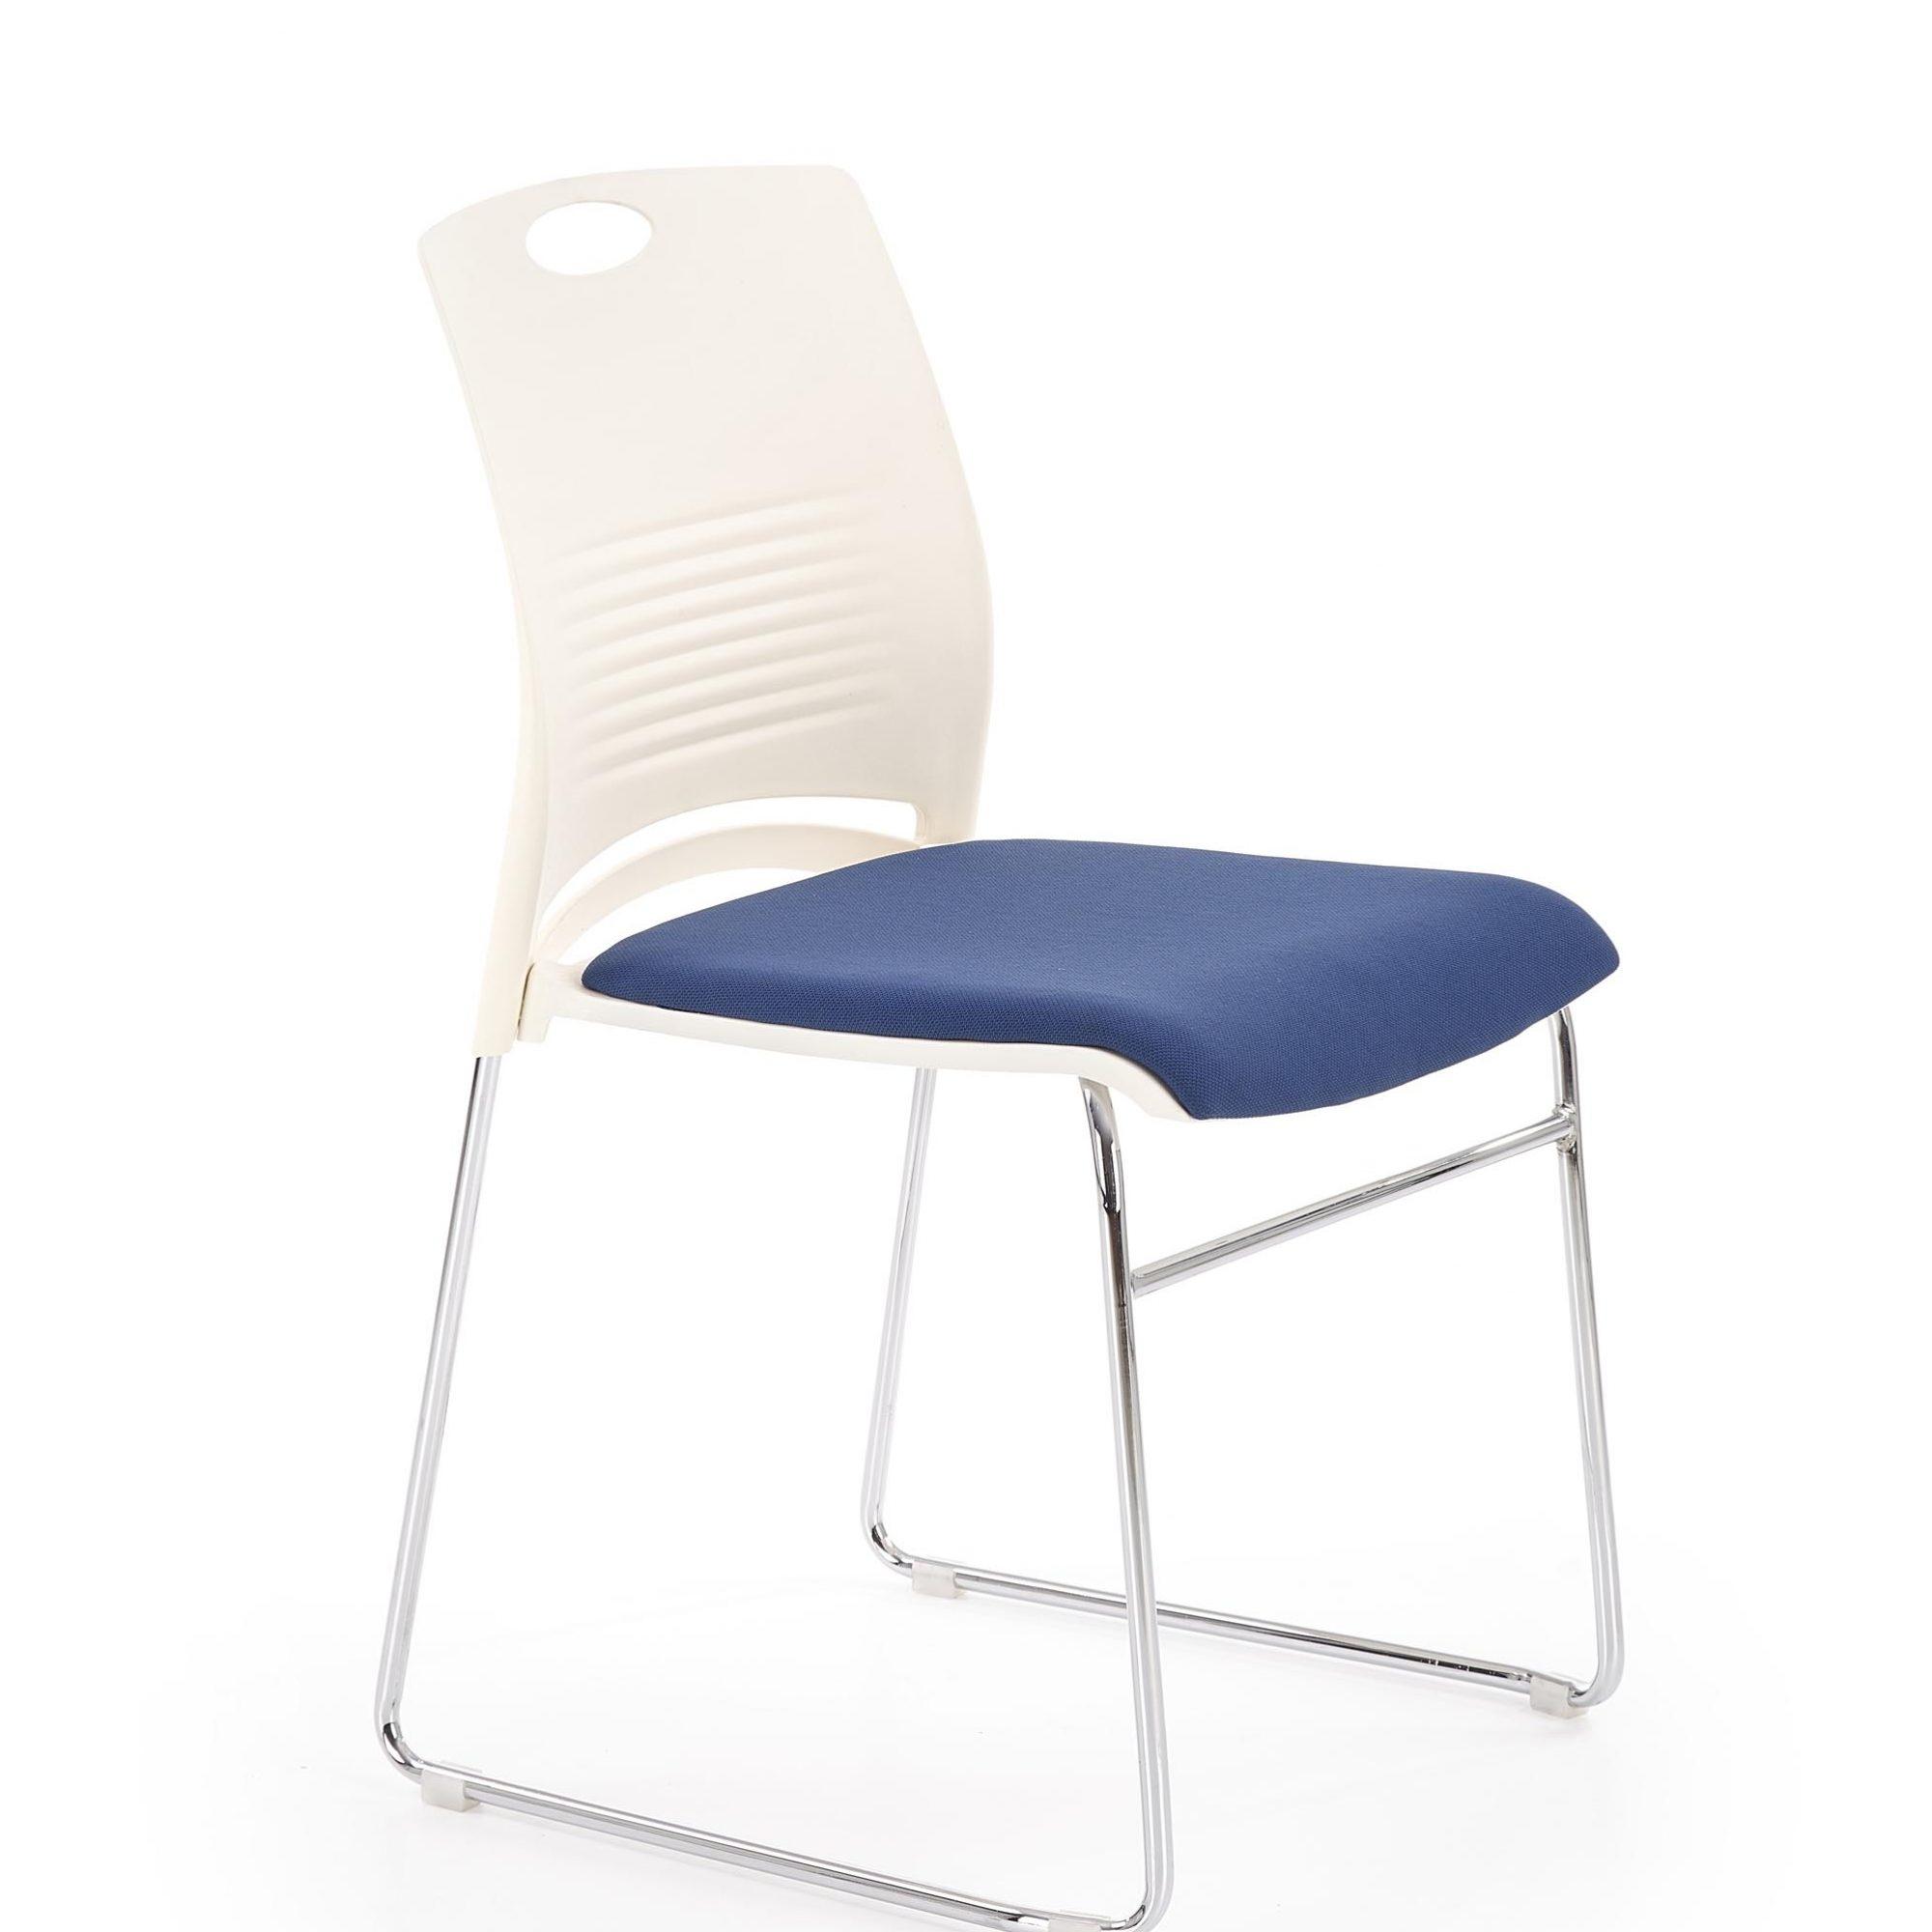 Scaun din plastic, cu sezut tapitat cu stofa si picioare metalice Calis Alb / Albastru, l44xA52xH80 cm imagine